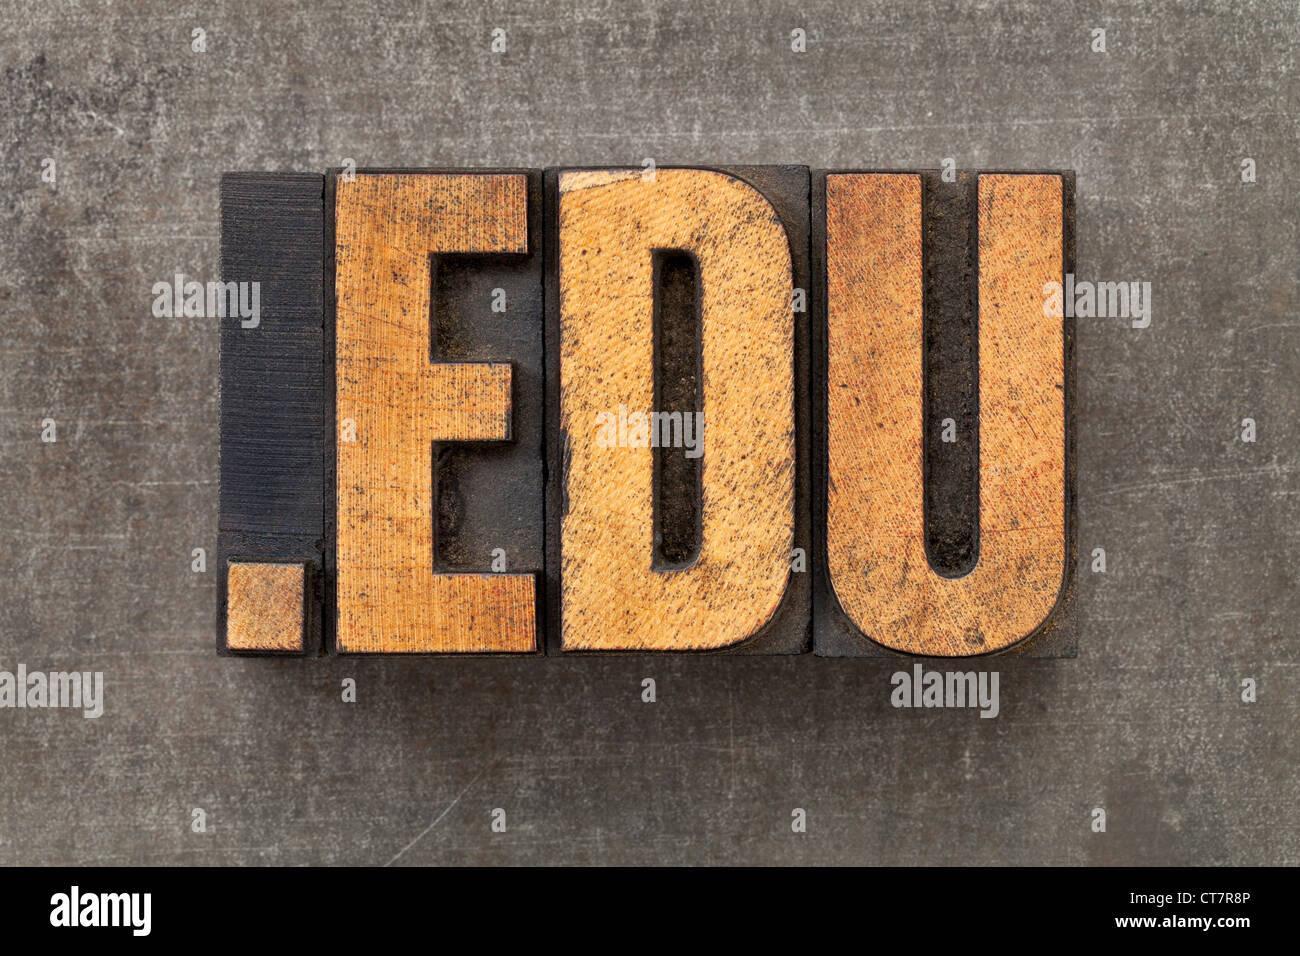 dot edu - internet domain for education in vintage wooden letterpress printing blocks on a grunge metal sheet - Stock Image